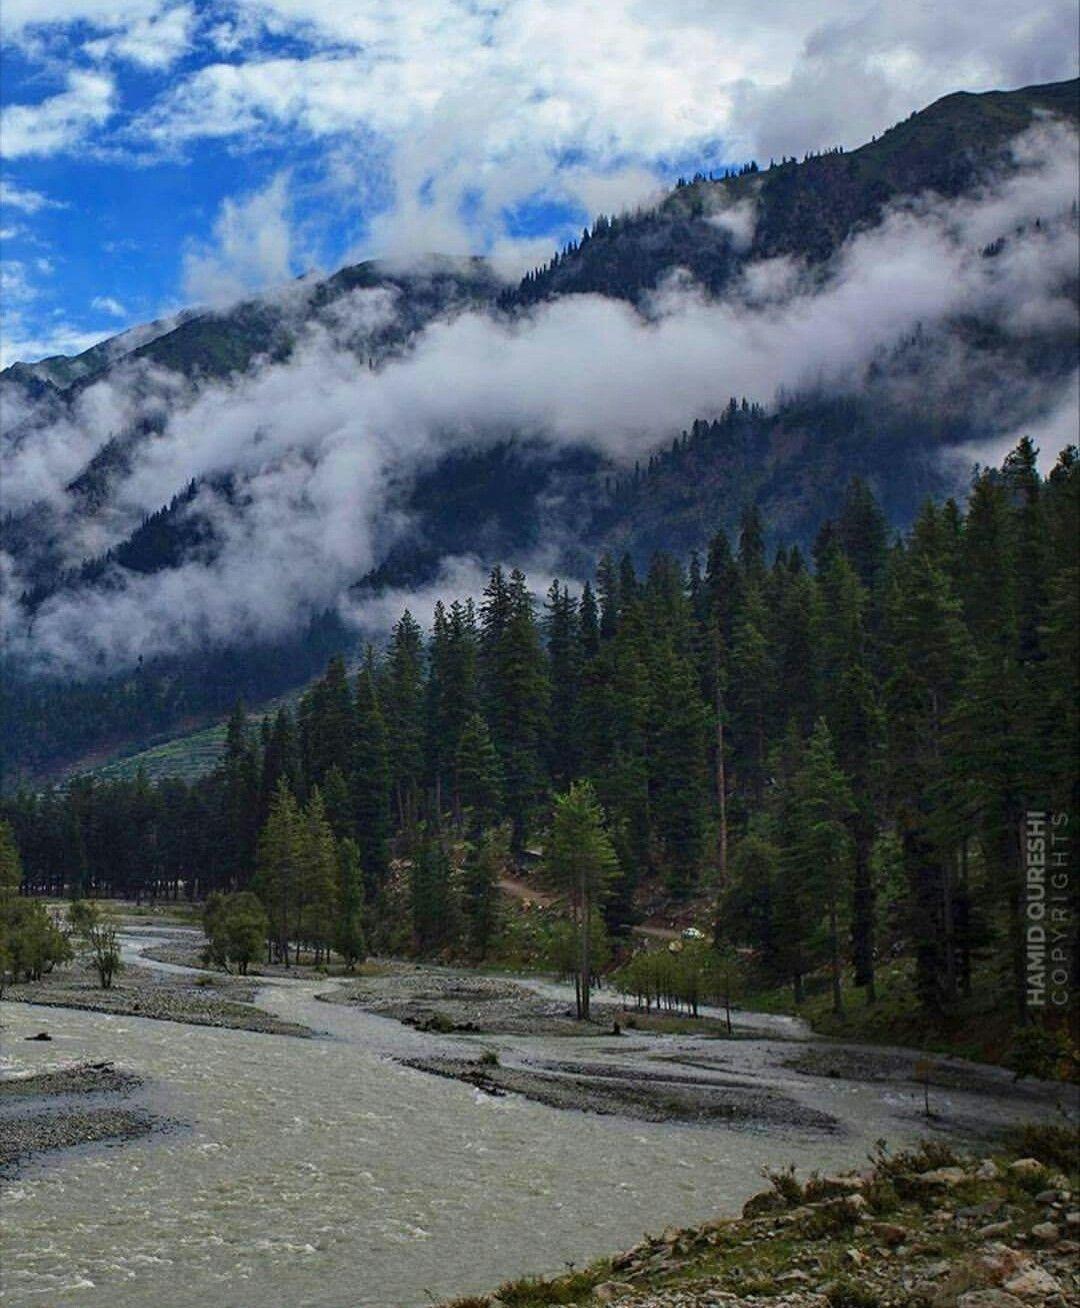 ushu kalam swat valley,Pakistan